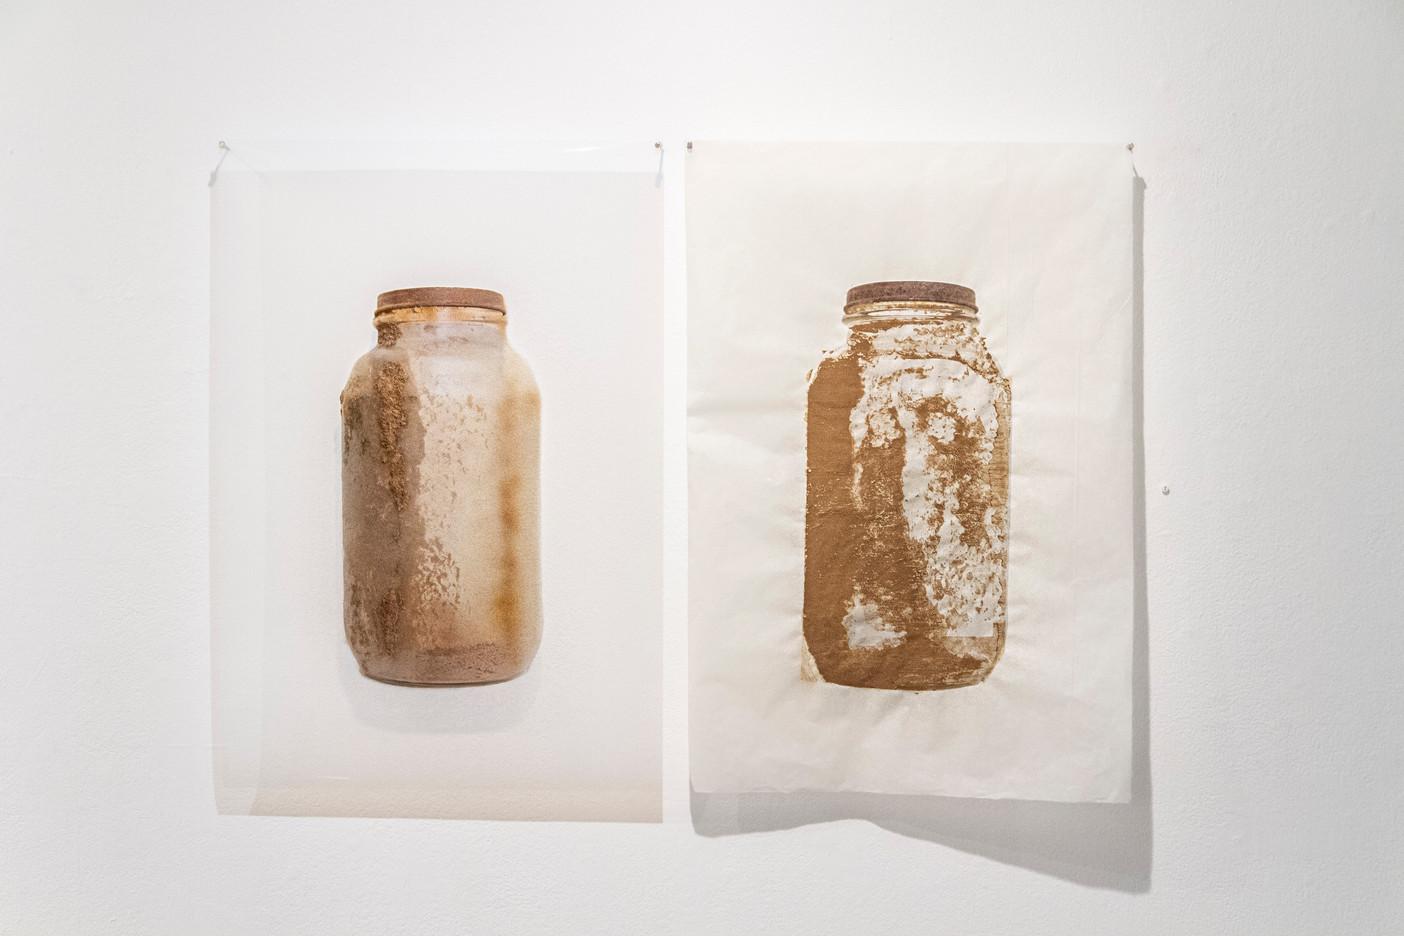 Large Jar (Immitation, Somewhat Missing The Mark)